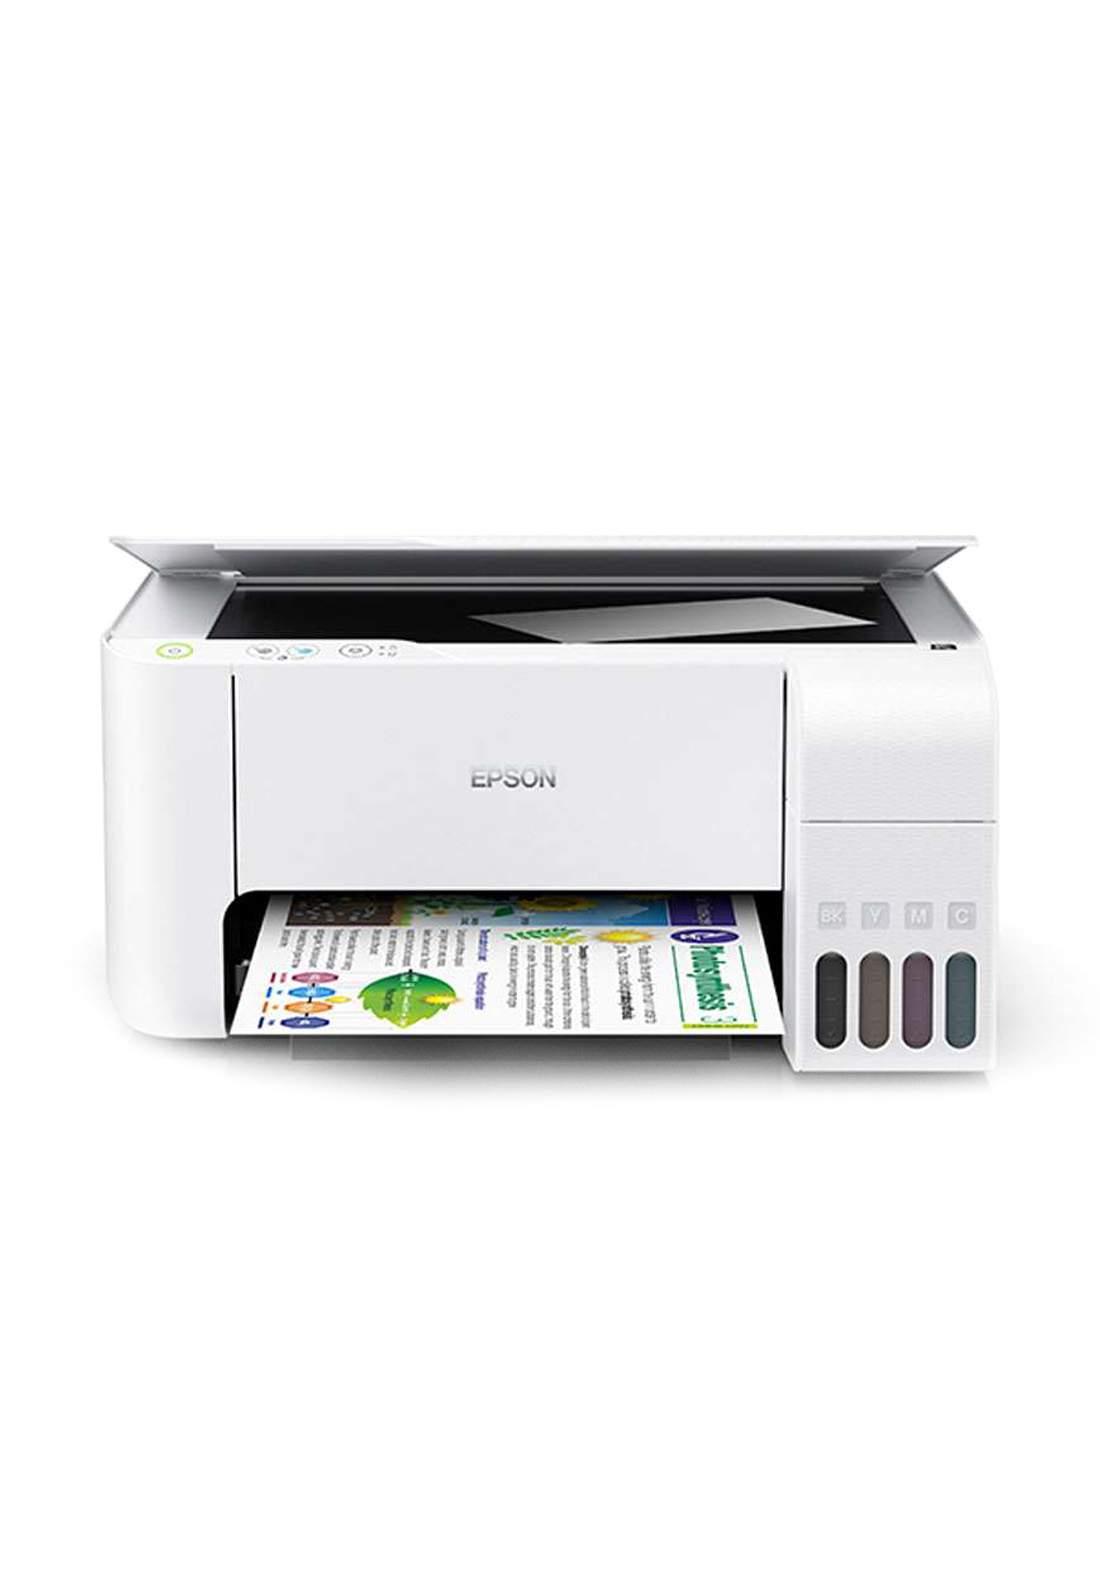 Epson EcoTank L3116 All-in-One Ink Tank Printer - White طابعة